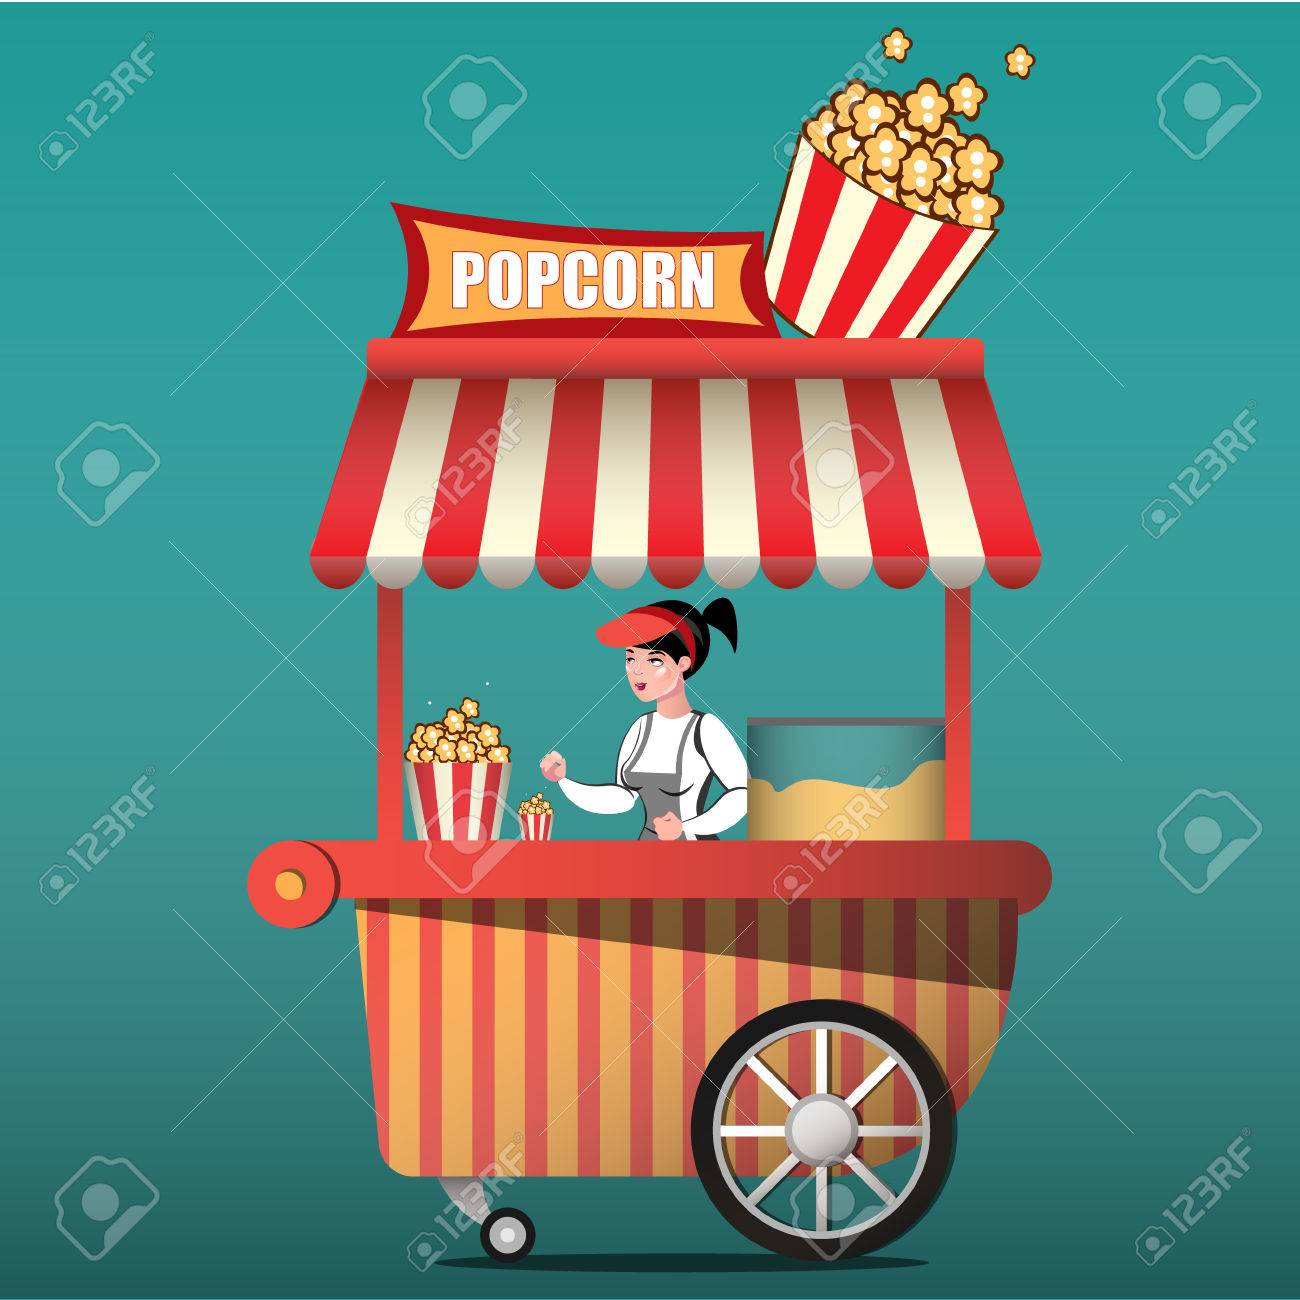 Popcorn cart carnival store and fun festival popcorn cart. - 74005345